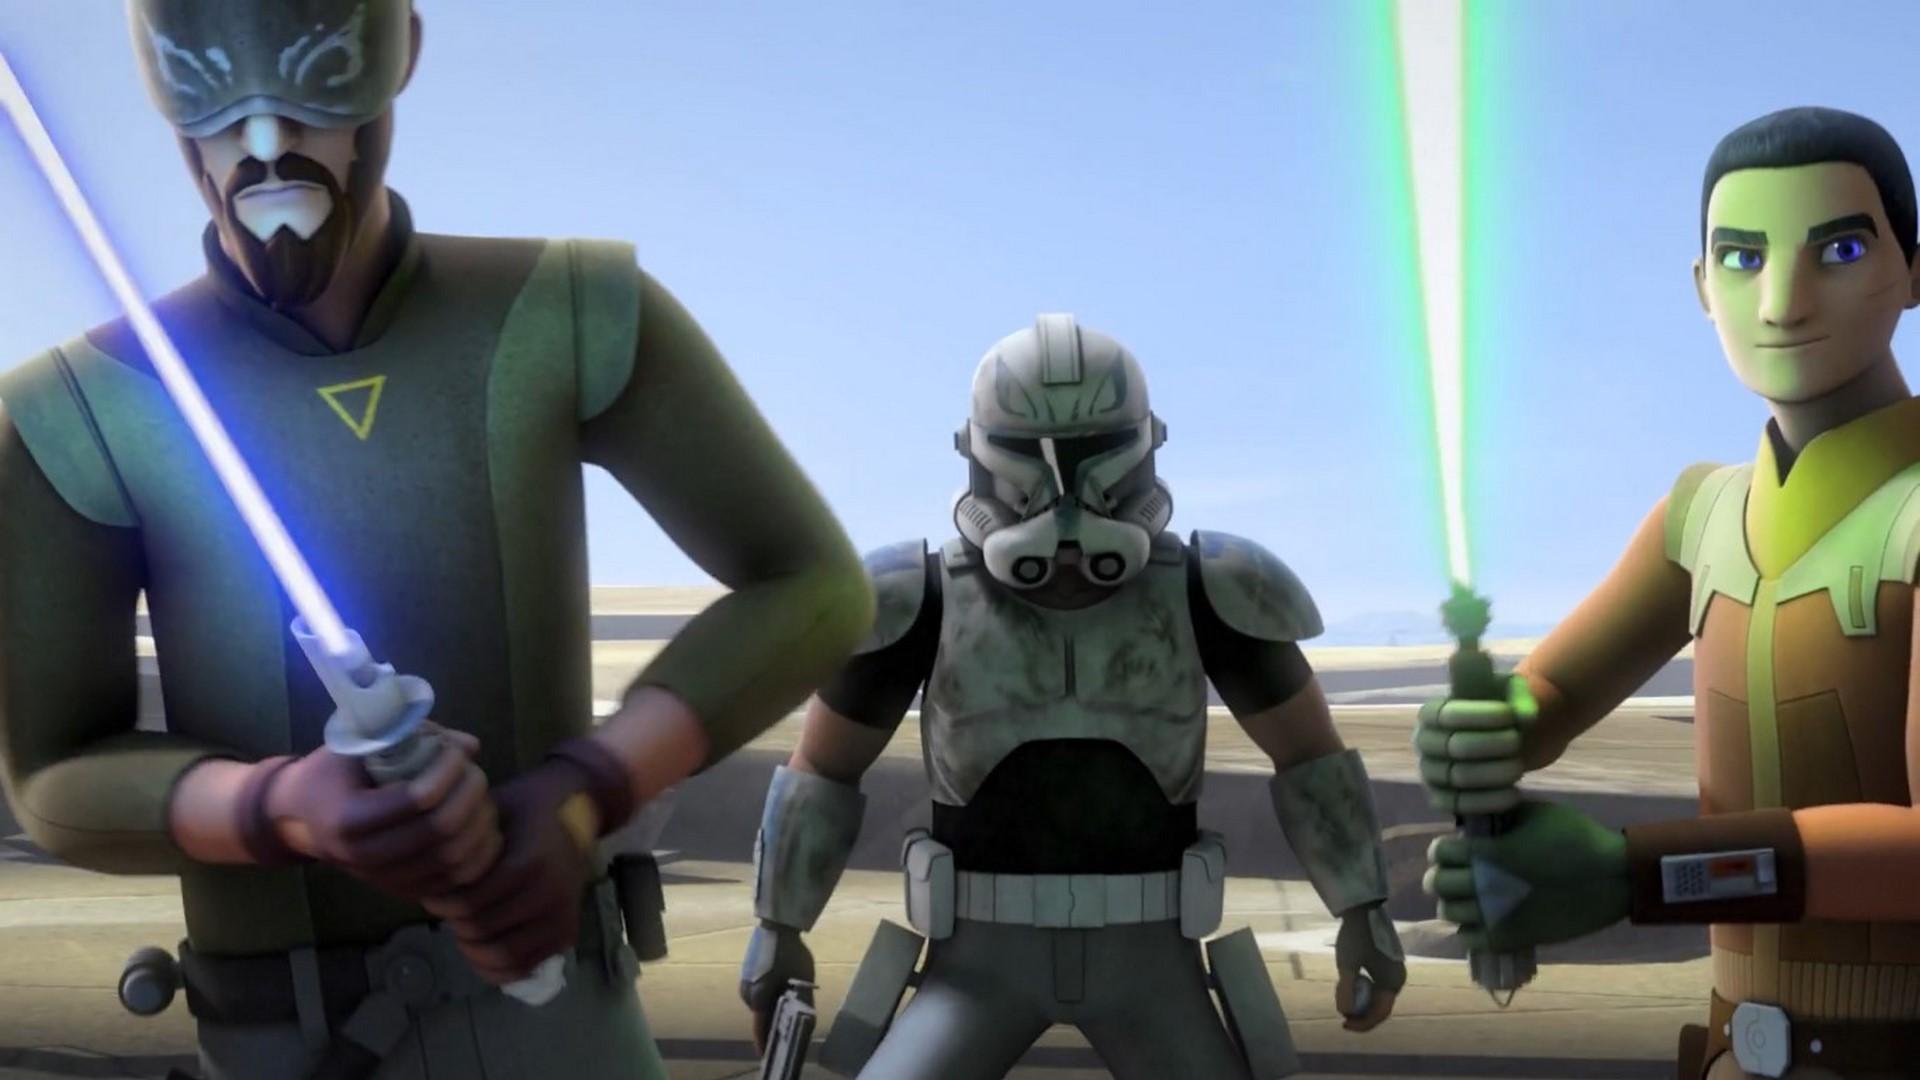 Star wars rebels air dates in Melbourne